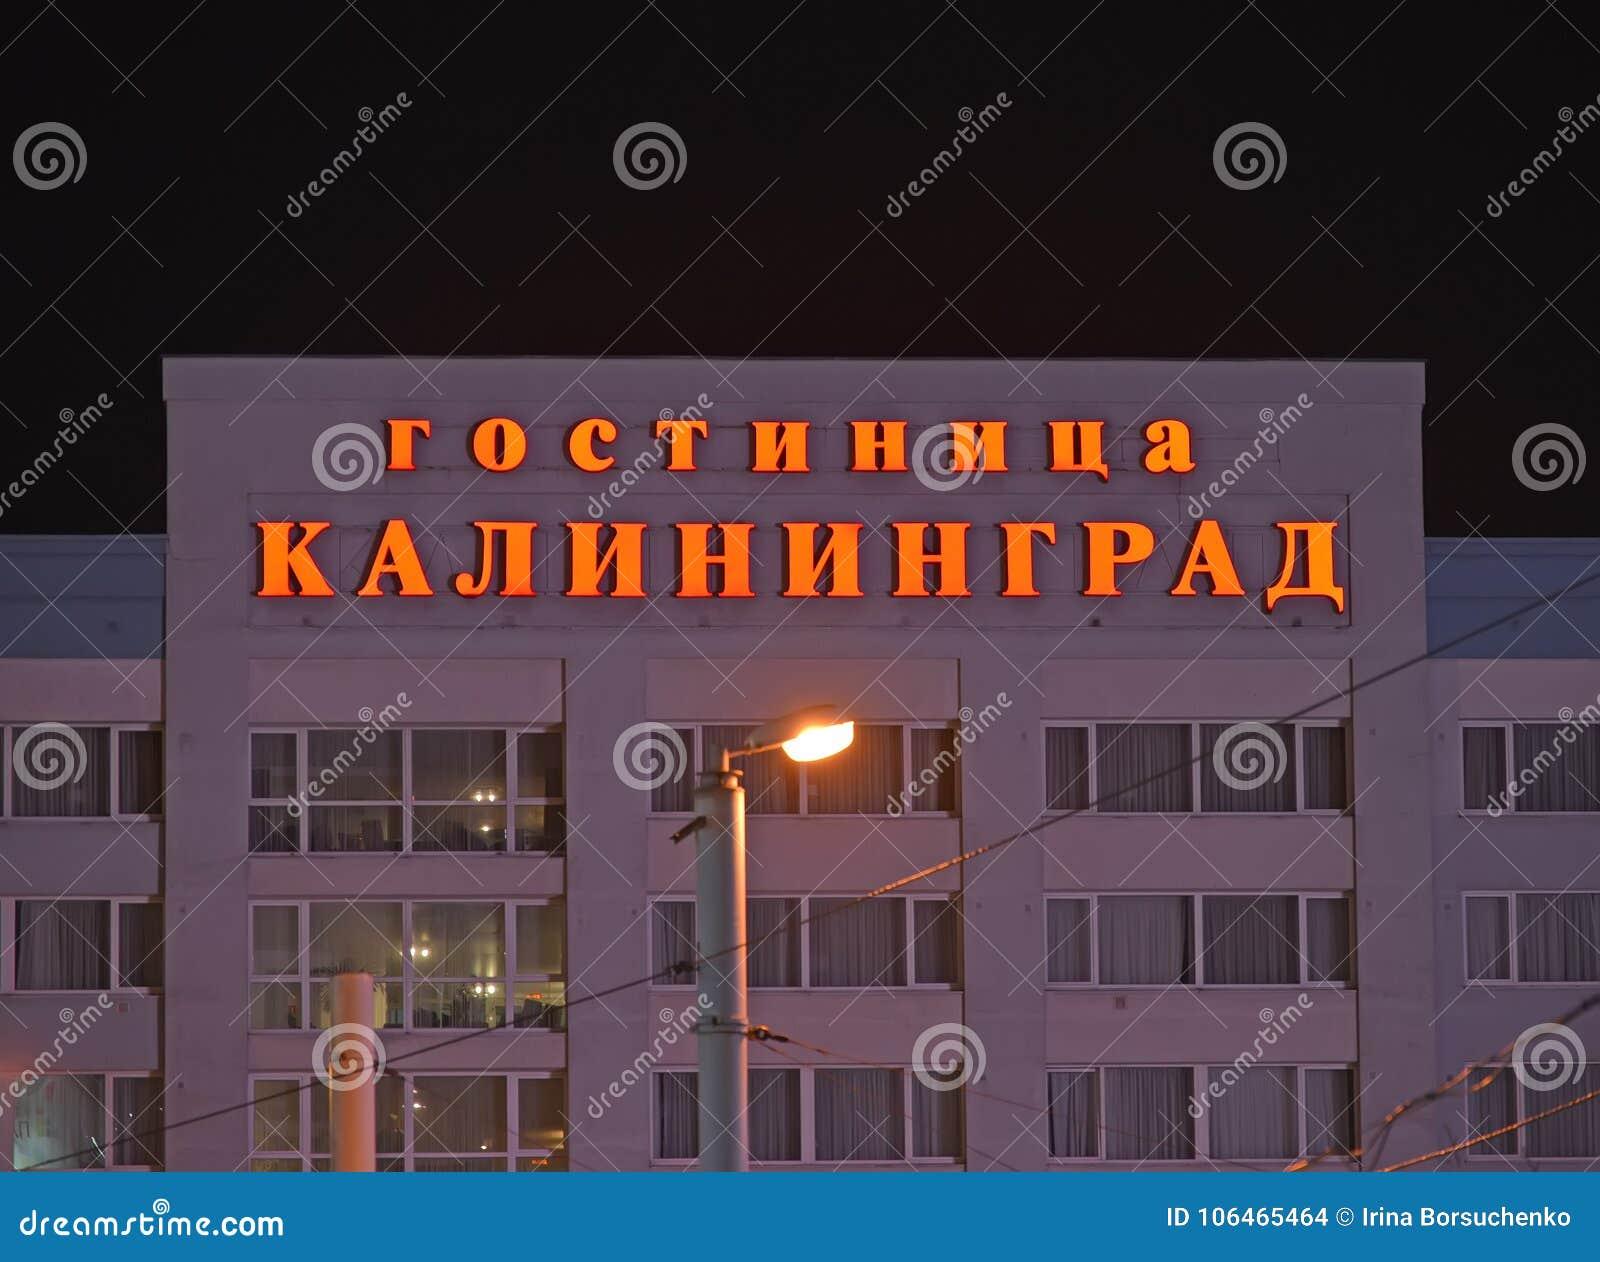 KALININGRAD, RUSSIA  The Shining Sign Name Kaliningrad Hotel